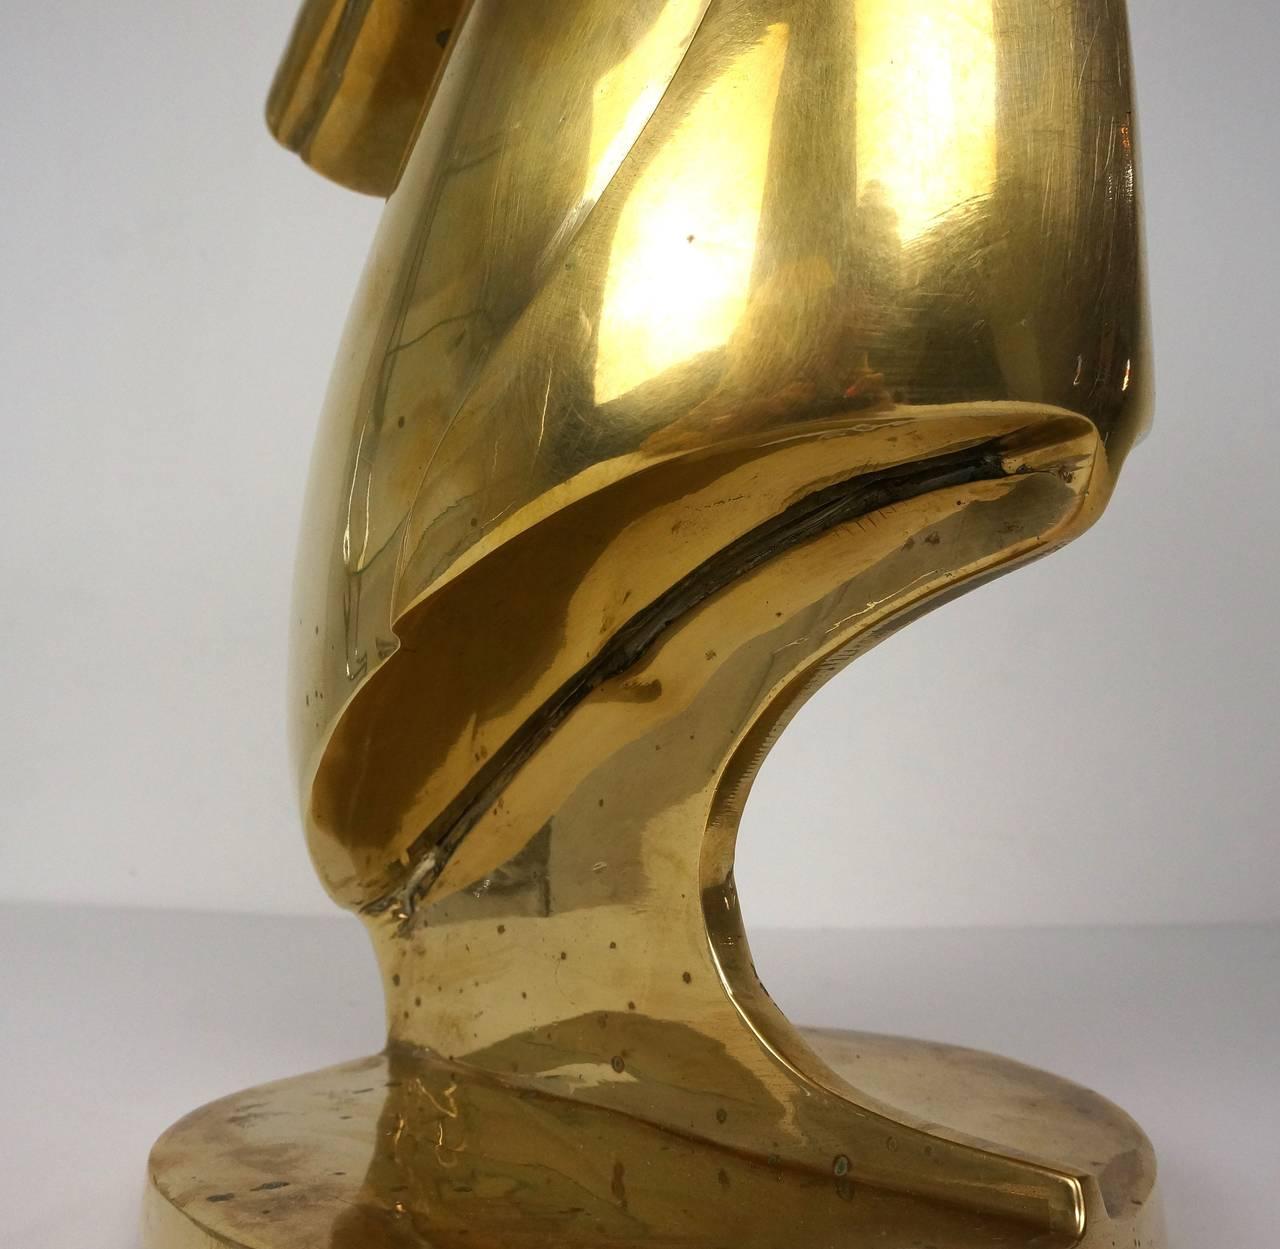 Art Deco Style Sculpture of a Gazelle / Antelope in Cast Brass, Mid-Century 3